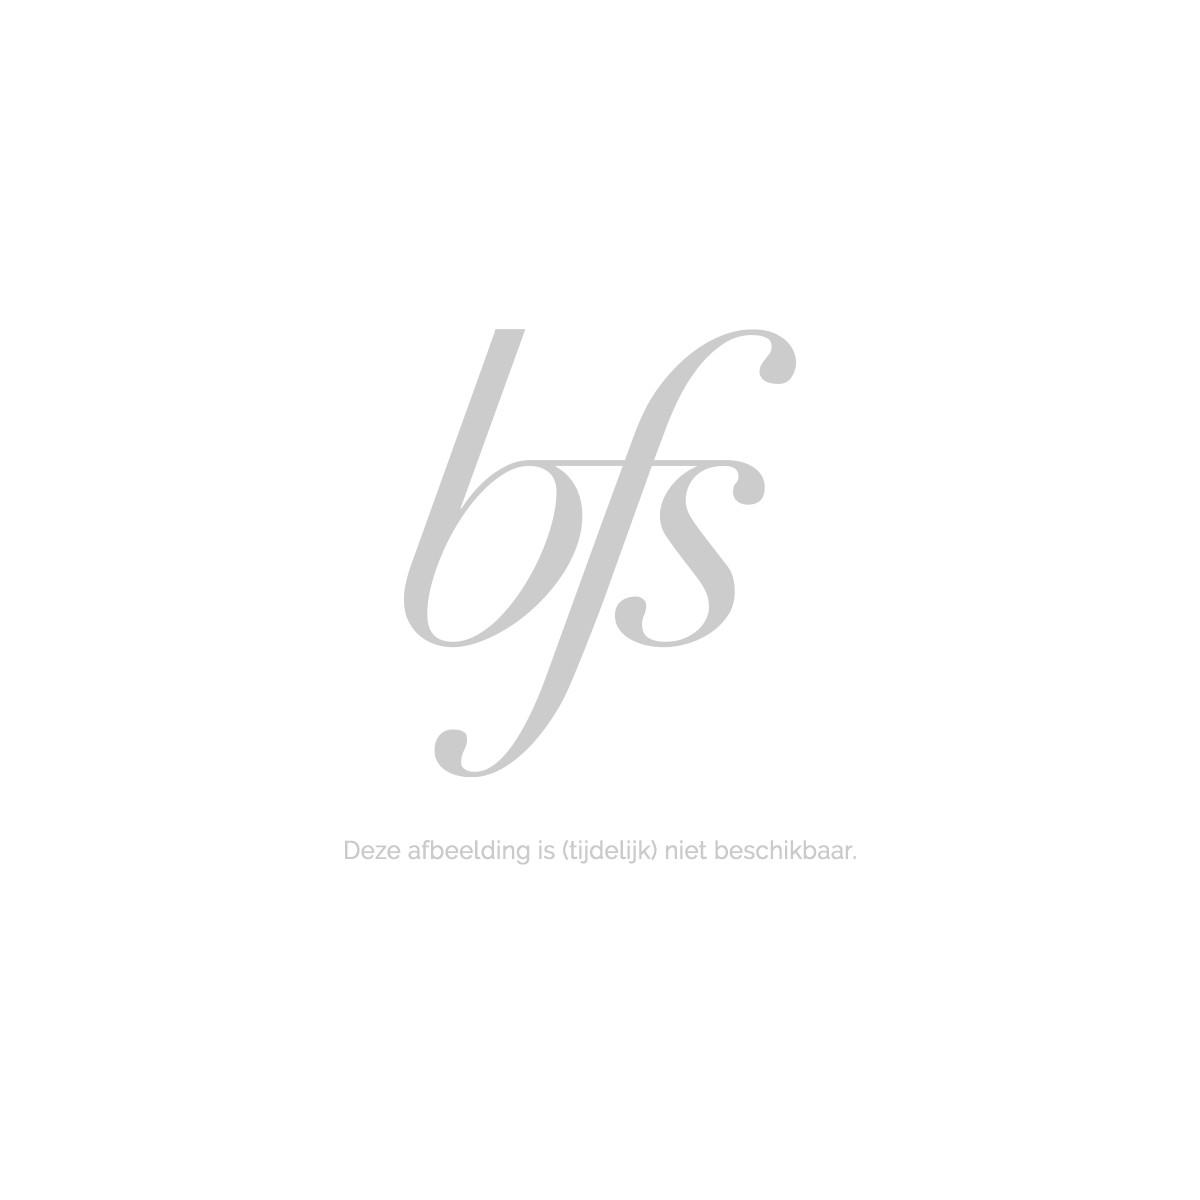 Elie Saab Girl Of Now Eau De Parfum 30 Ml Gnstig Hautpflege Kaufen